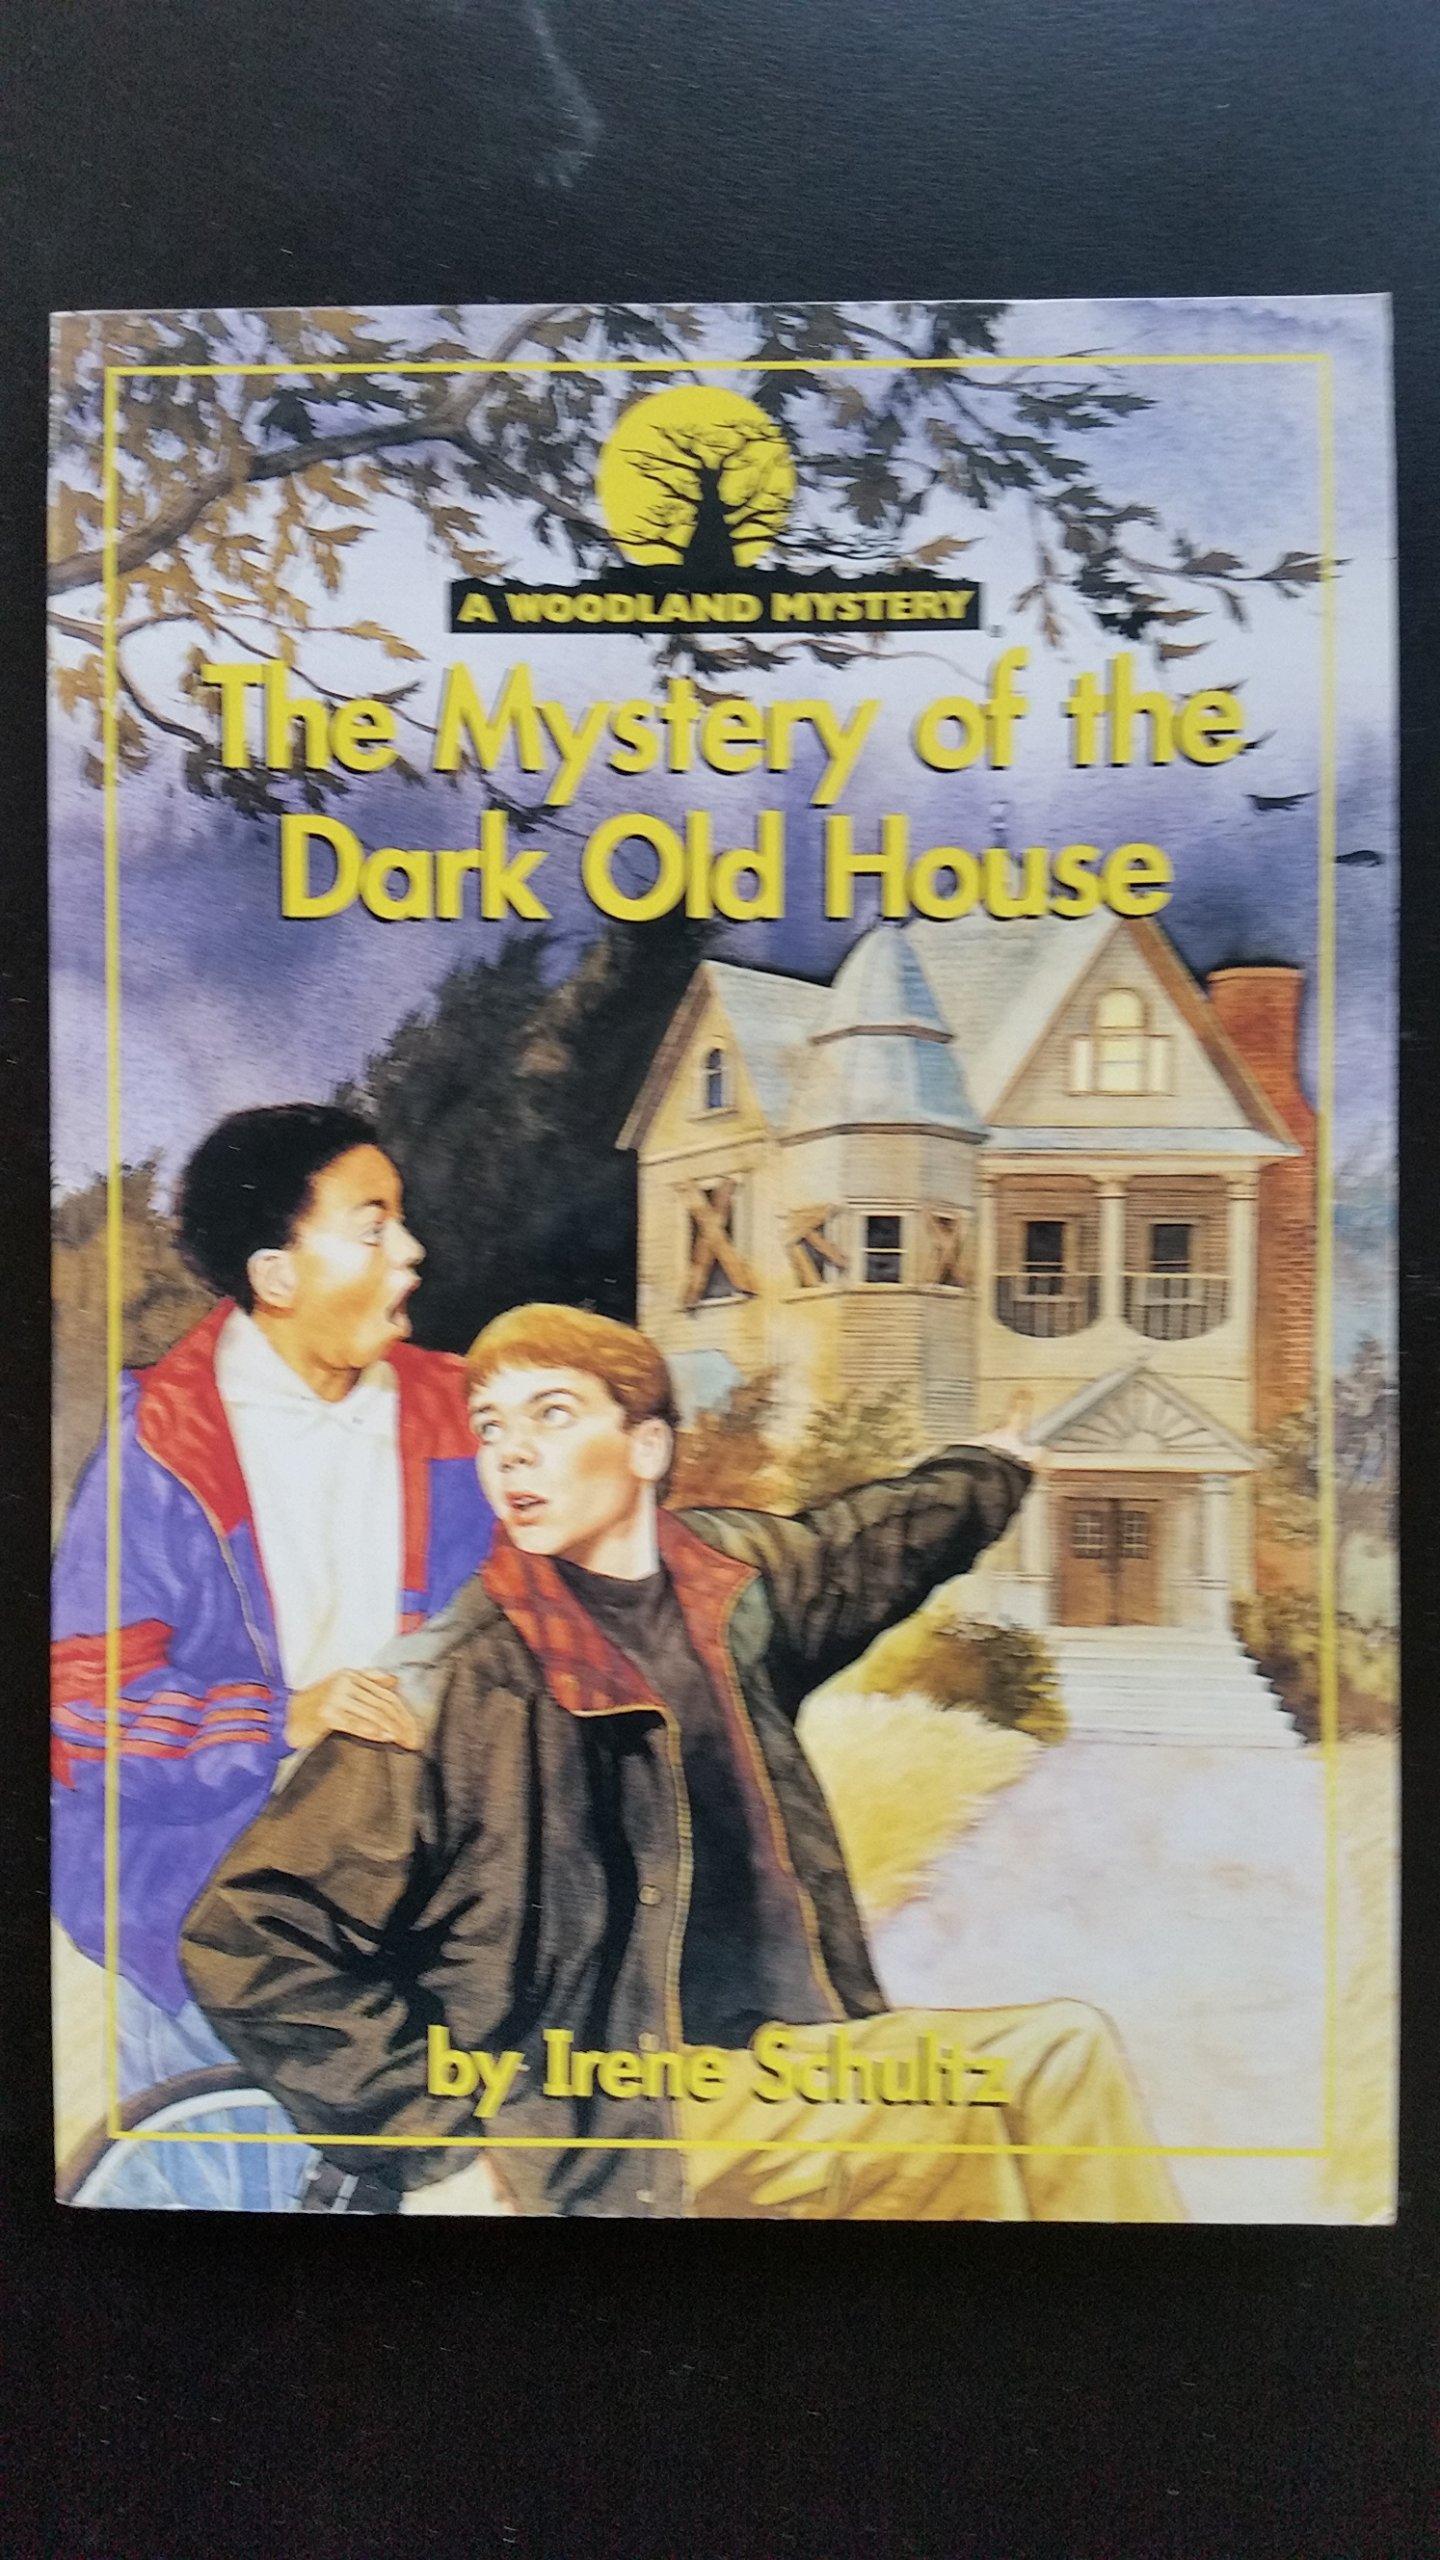 Mystery of the dark old house woodland m irene schultz mystery of the dark old house woodland m irene schultz 9780780272422 amazon books fandeluxe Choice Image